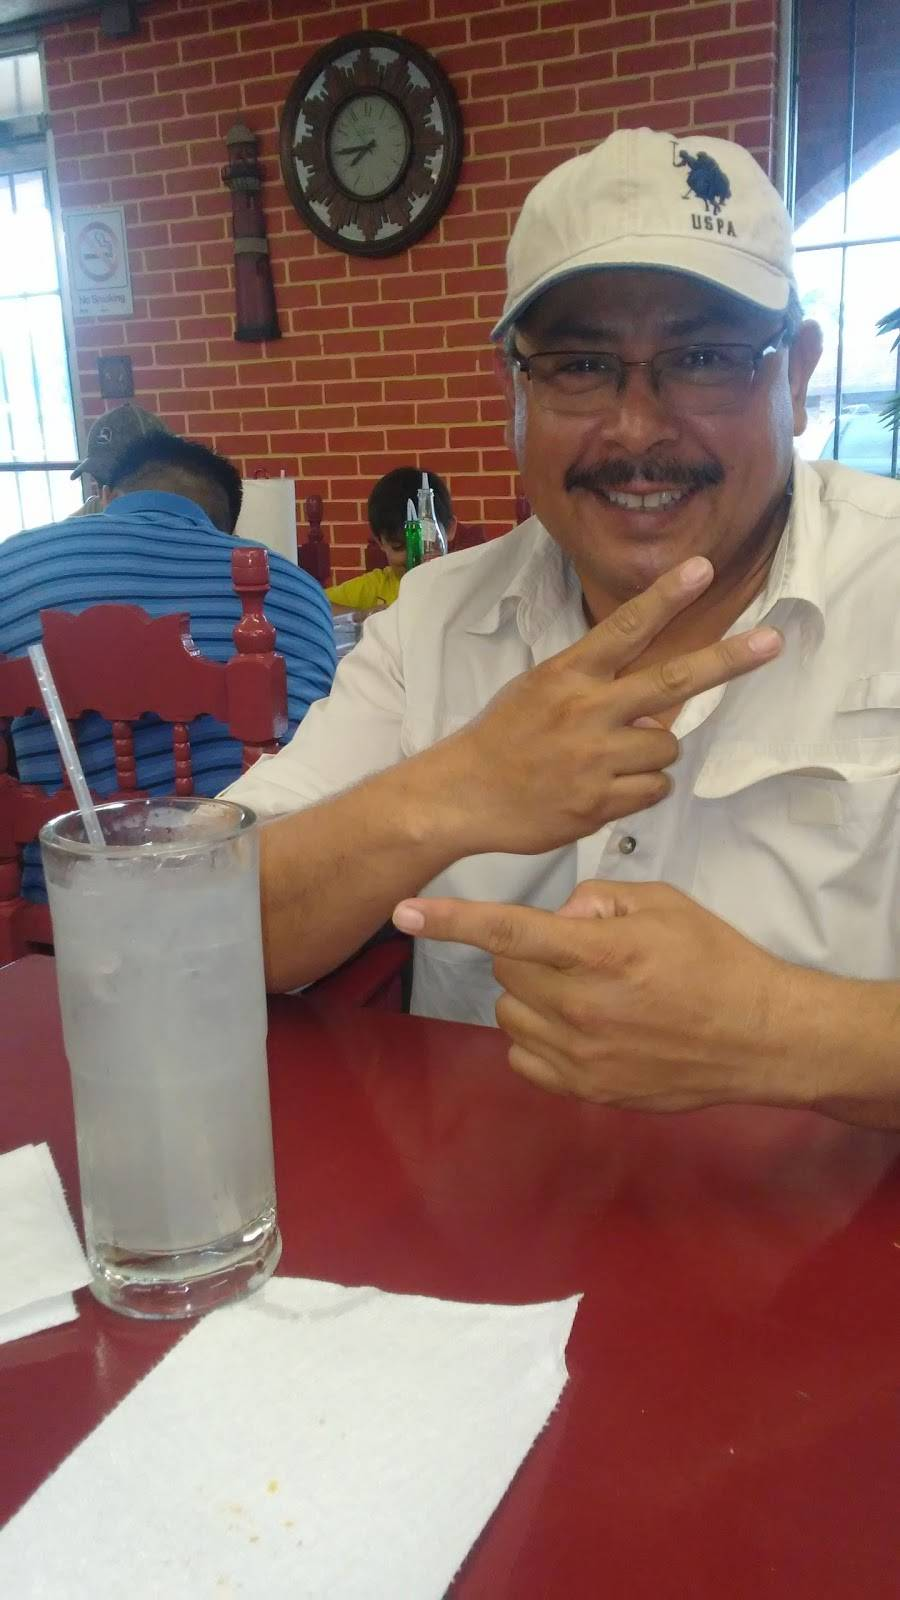 Vinces Seafood | restaurant | 5044 Gulfway Dr, Port Arthur, TX 77642, USA | 4099857731 OR +1 409-985-7731